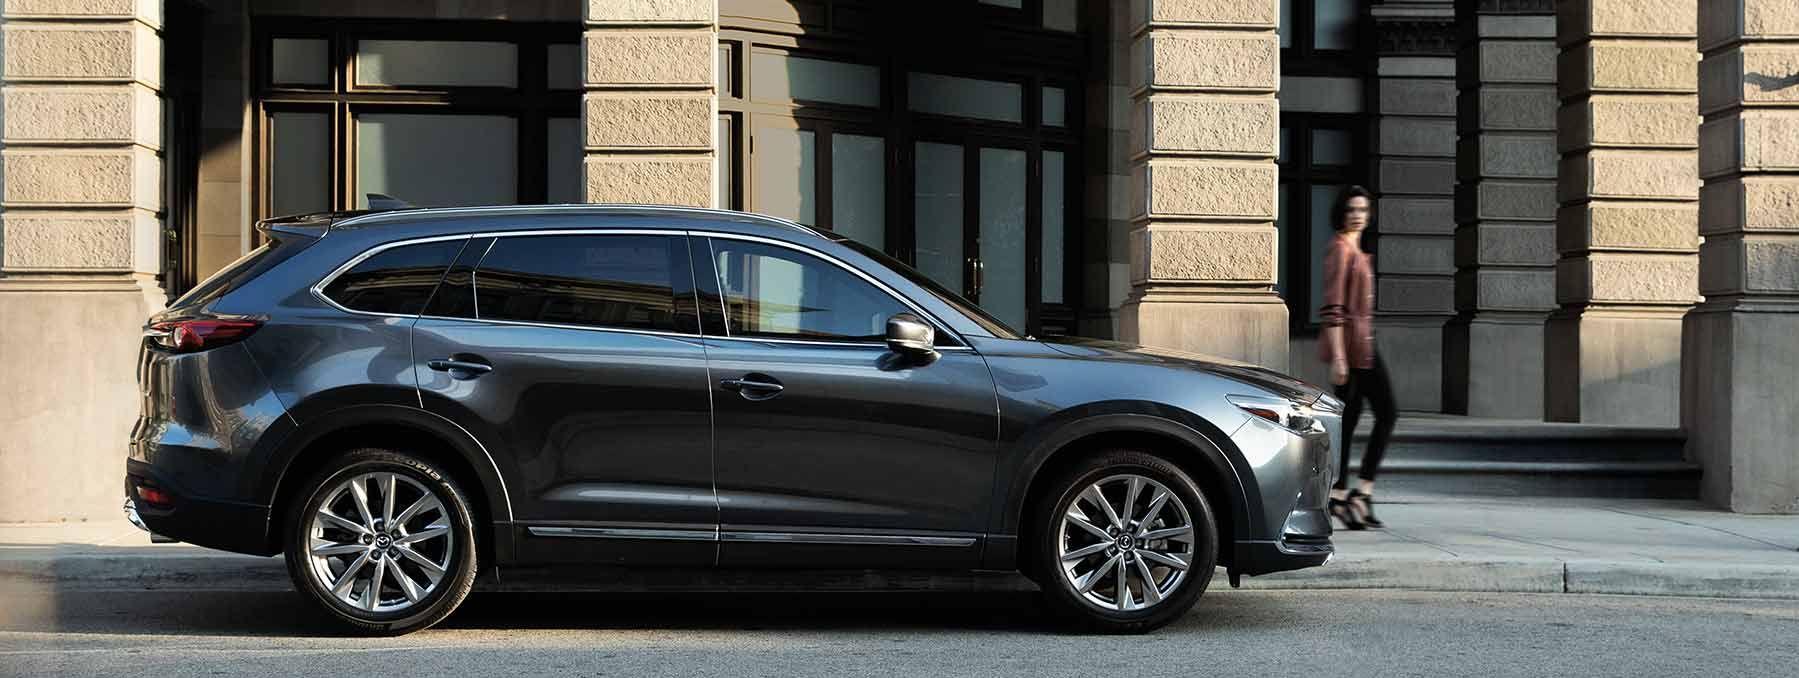 2019 Mazda CX-9 Financing near Silver Spring, MD